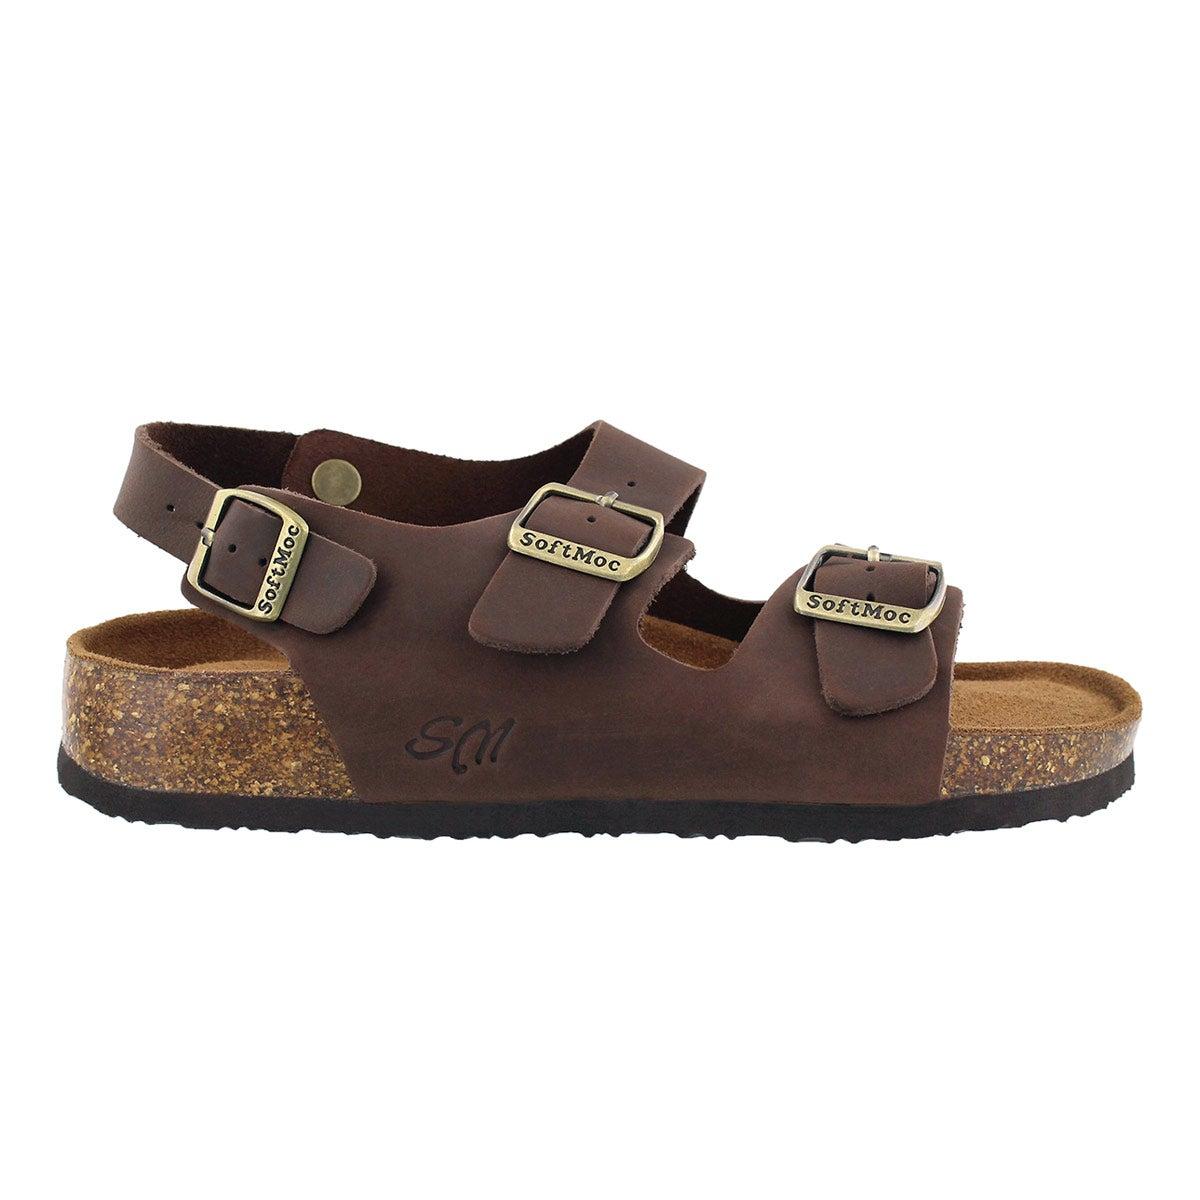 Lds Anika5 brn crz memory foam sandal